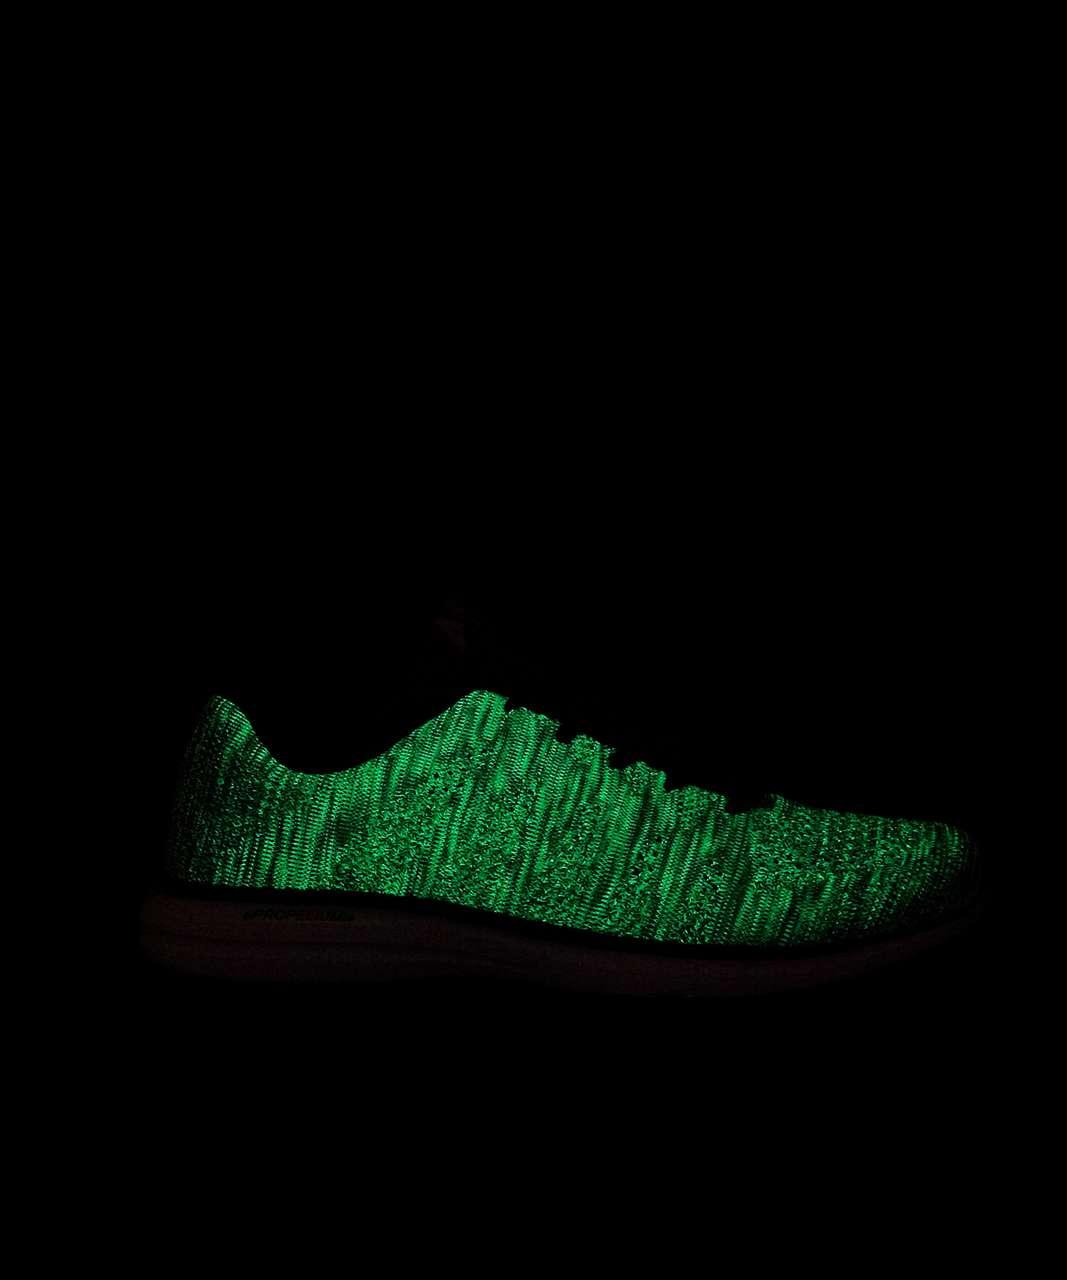 b6c2be23554 Lululemon Mens TechLoom Pro Shoe - Black / Grey Glow / Melange ...